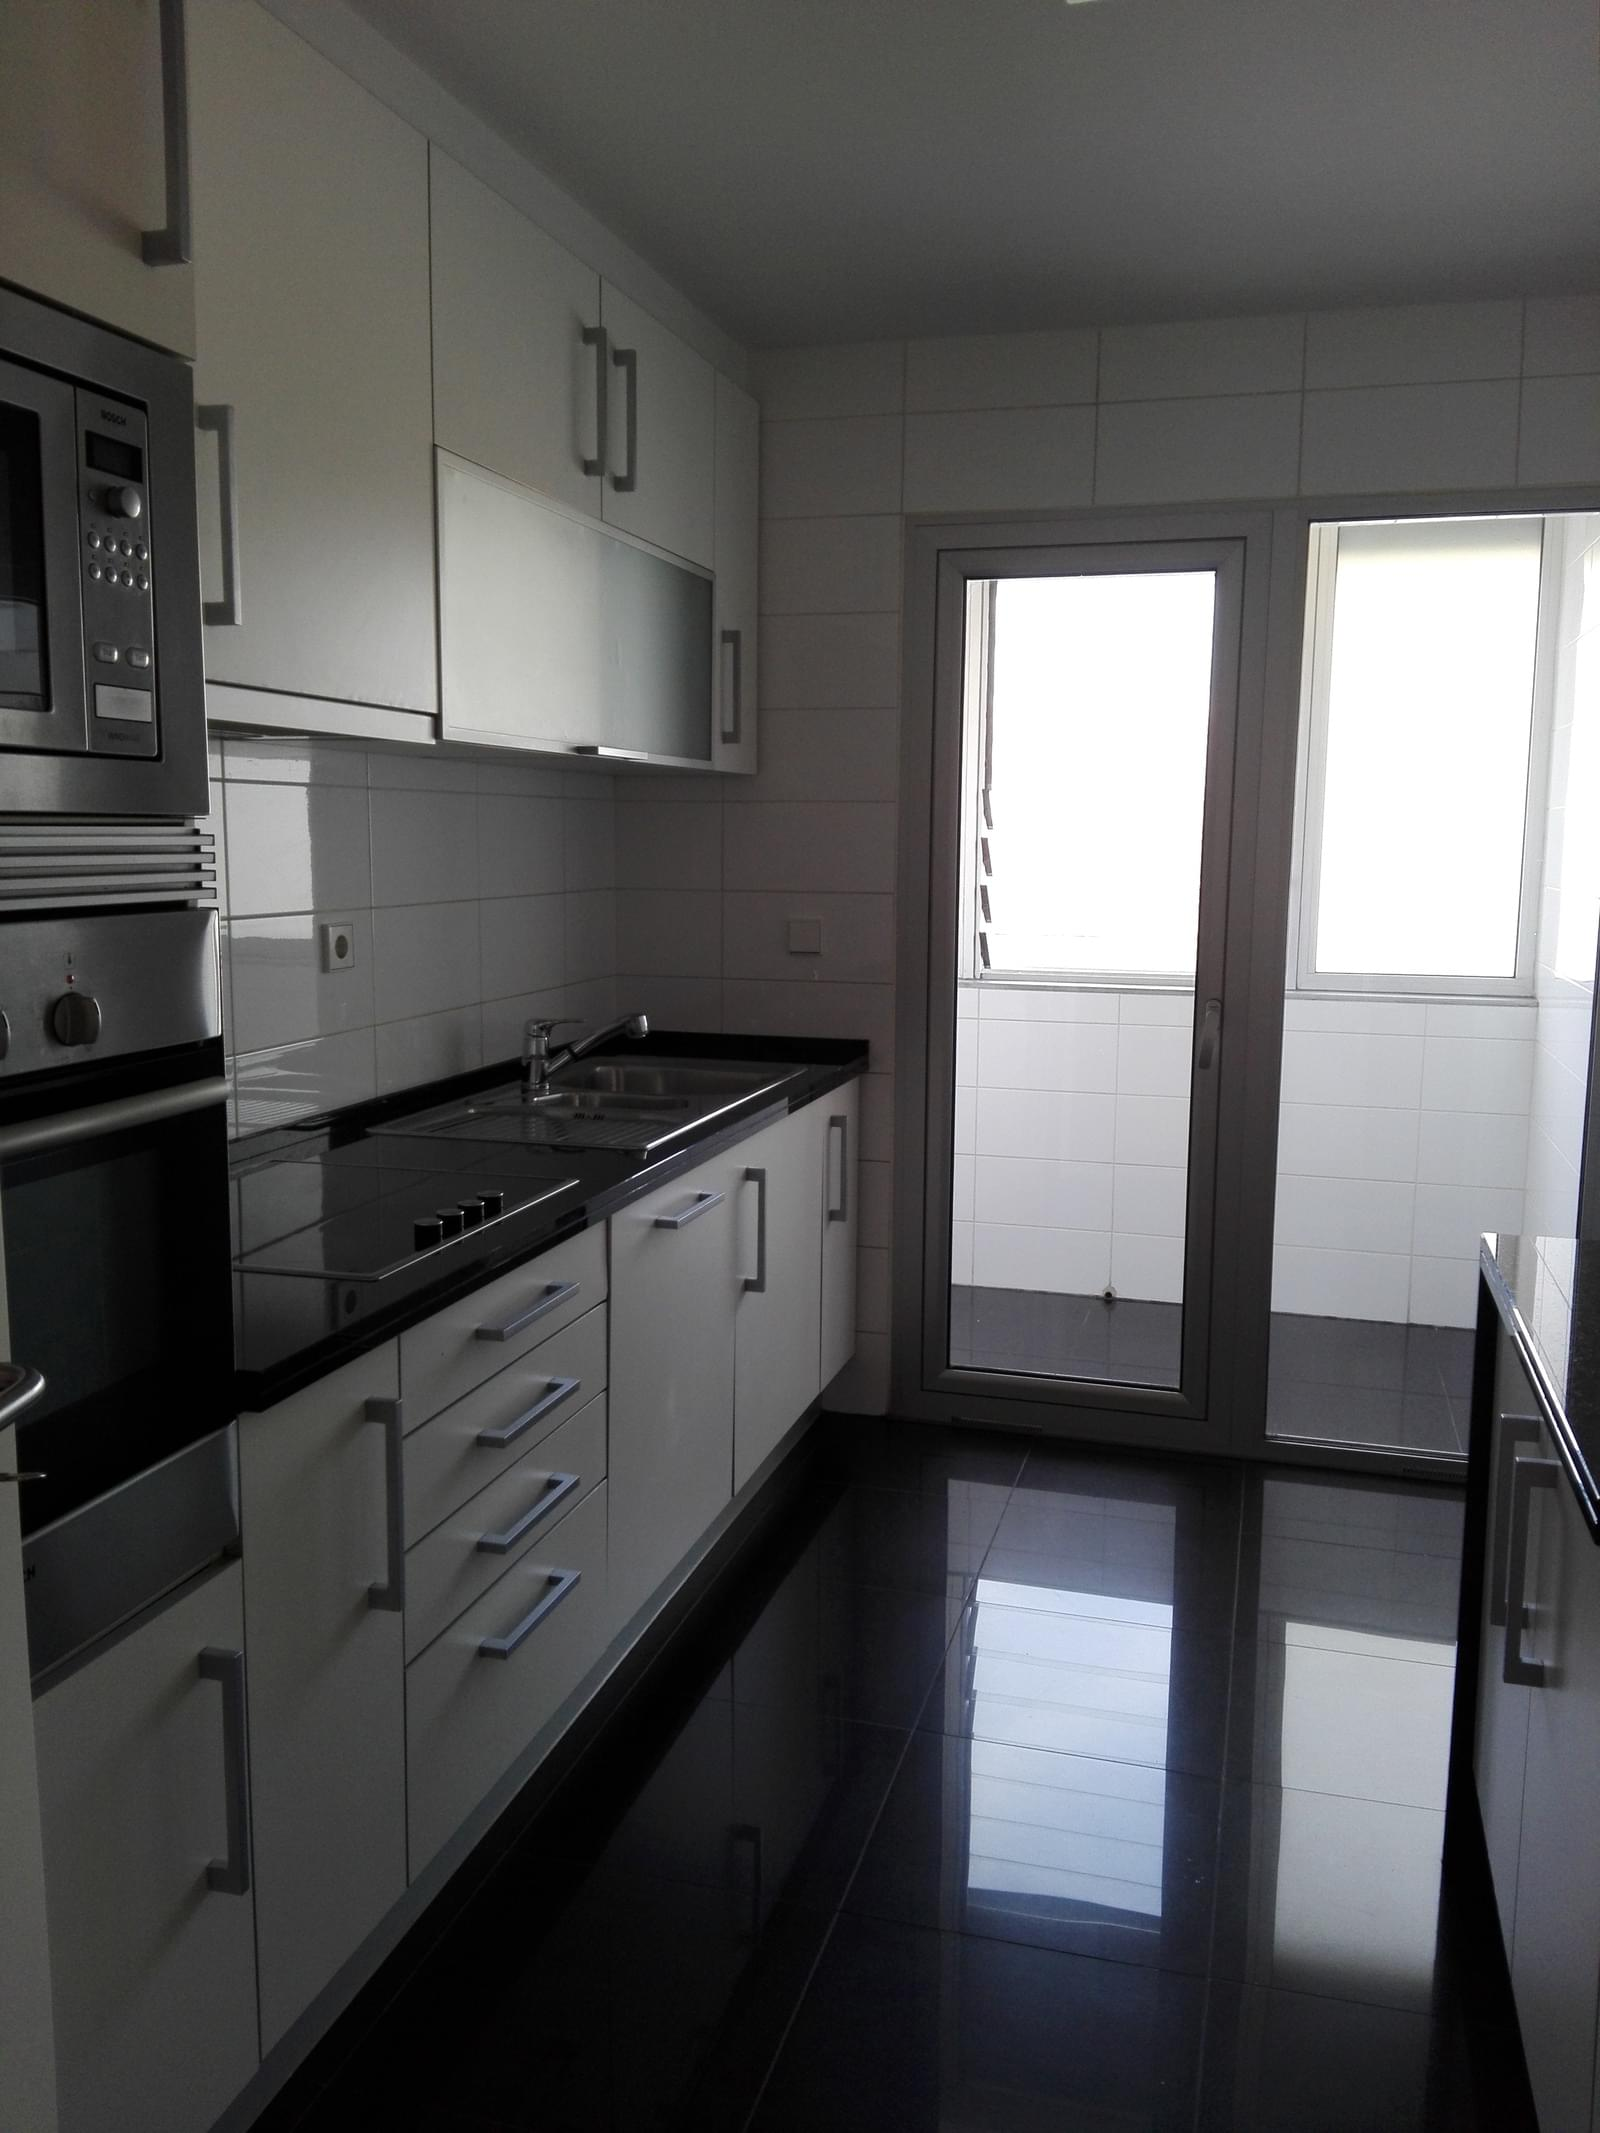 pf18814-apartamento-t2-lisboa-ab5f26c8-8747-43cf-a24b-c70c0a1986ed